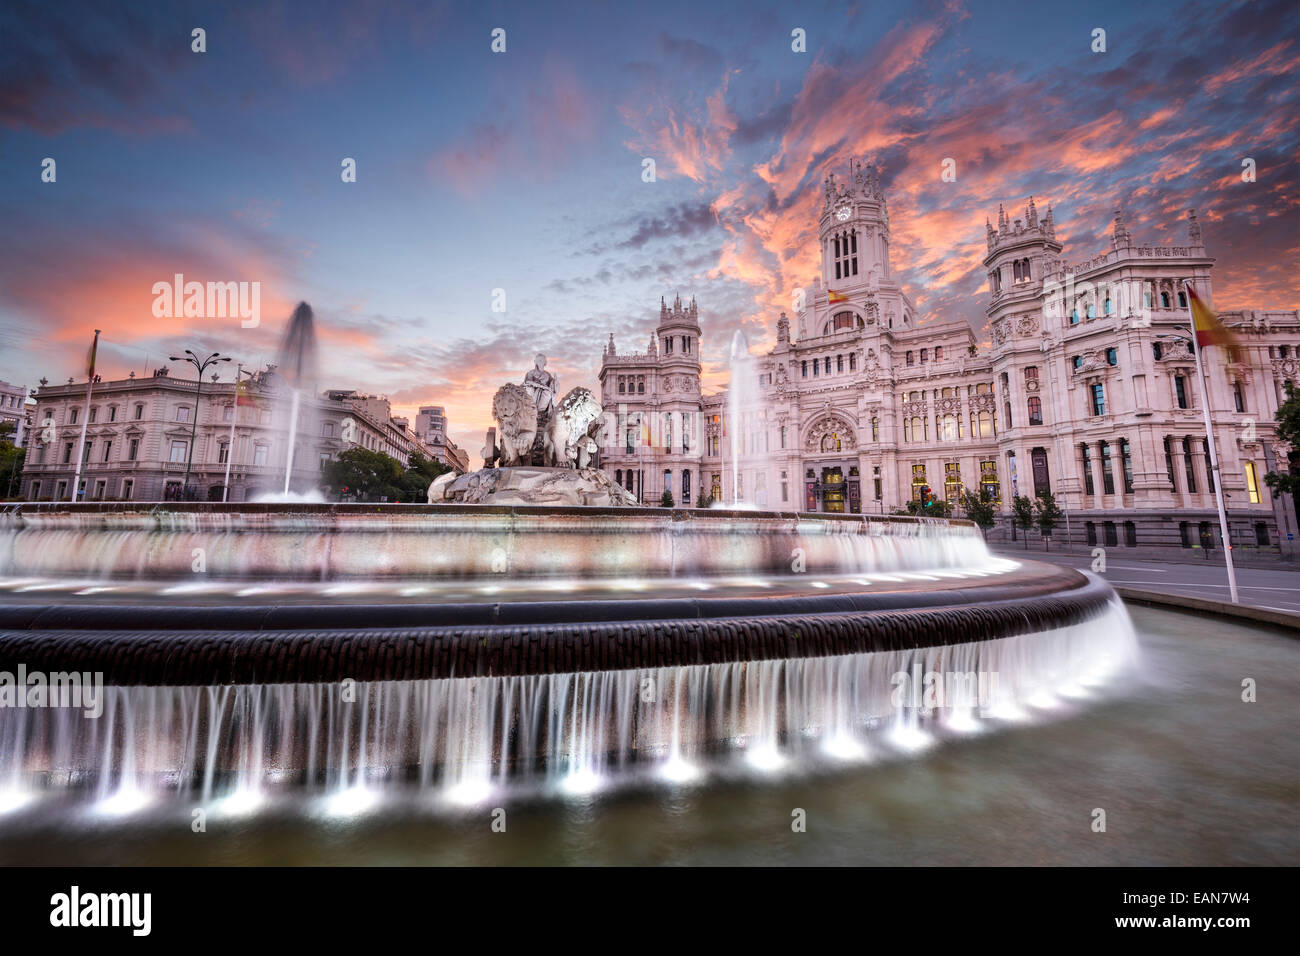 Madrid, Spain at Communication Palace and Cibeles Plaza. - Stock Image